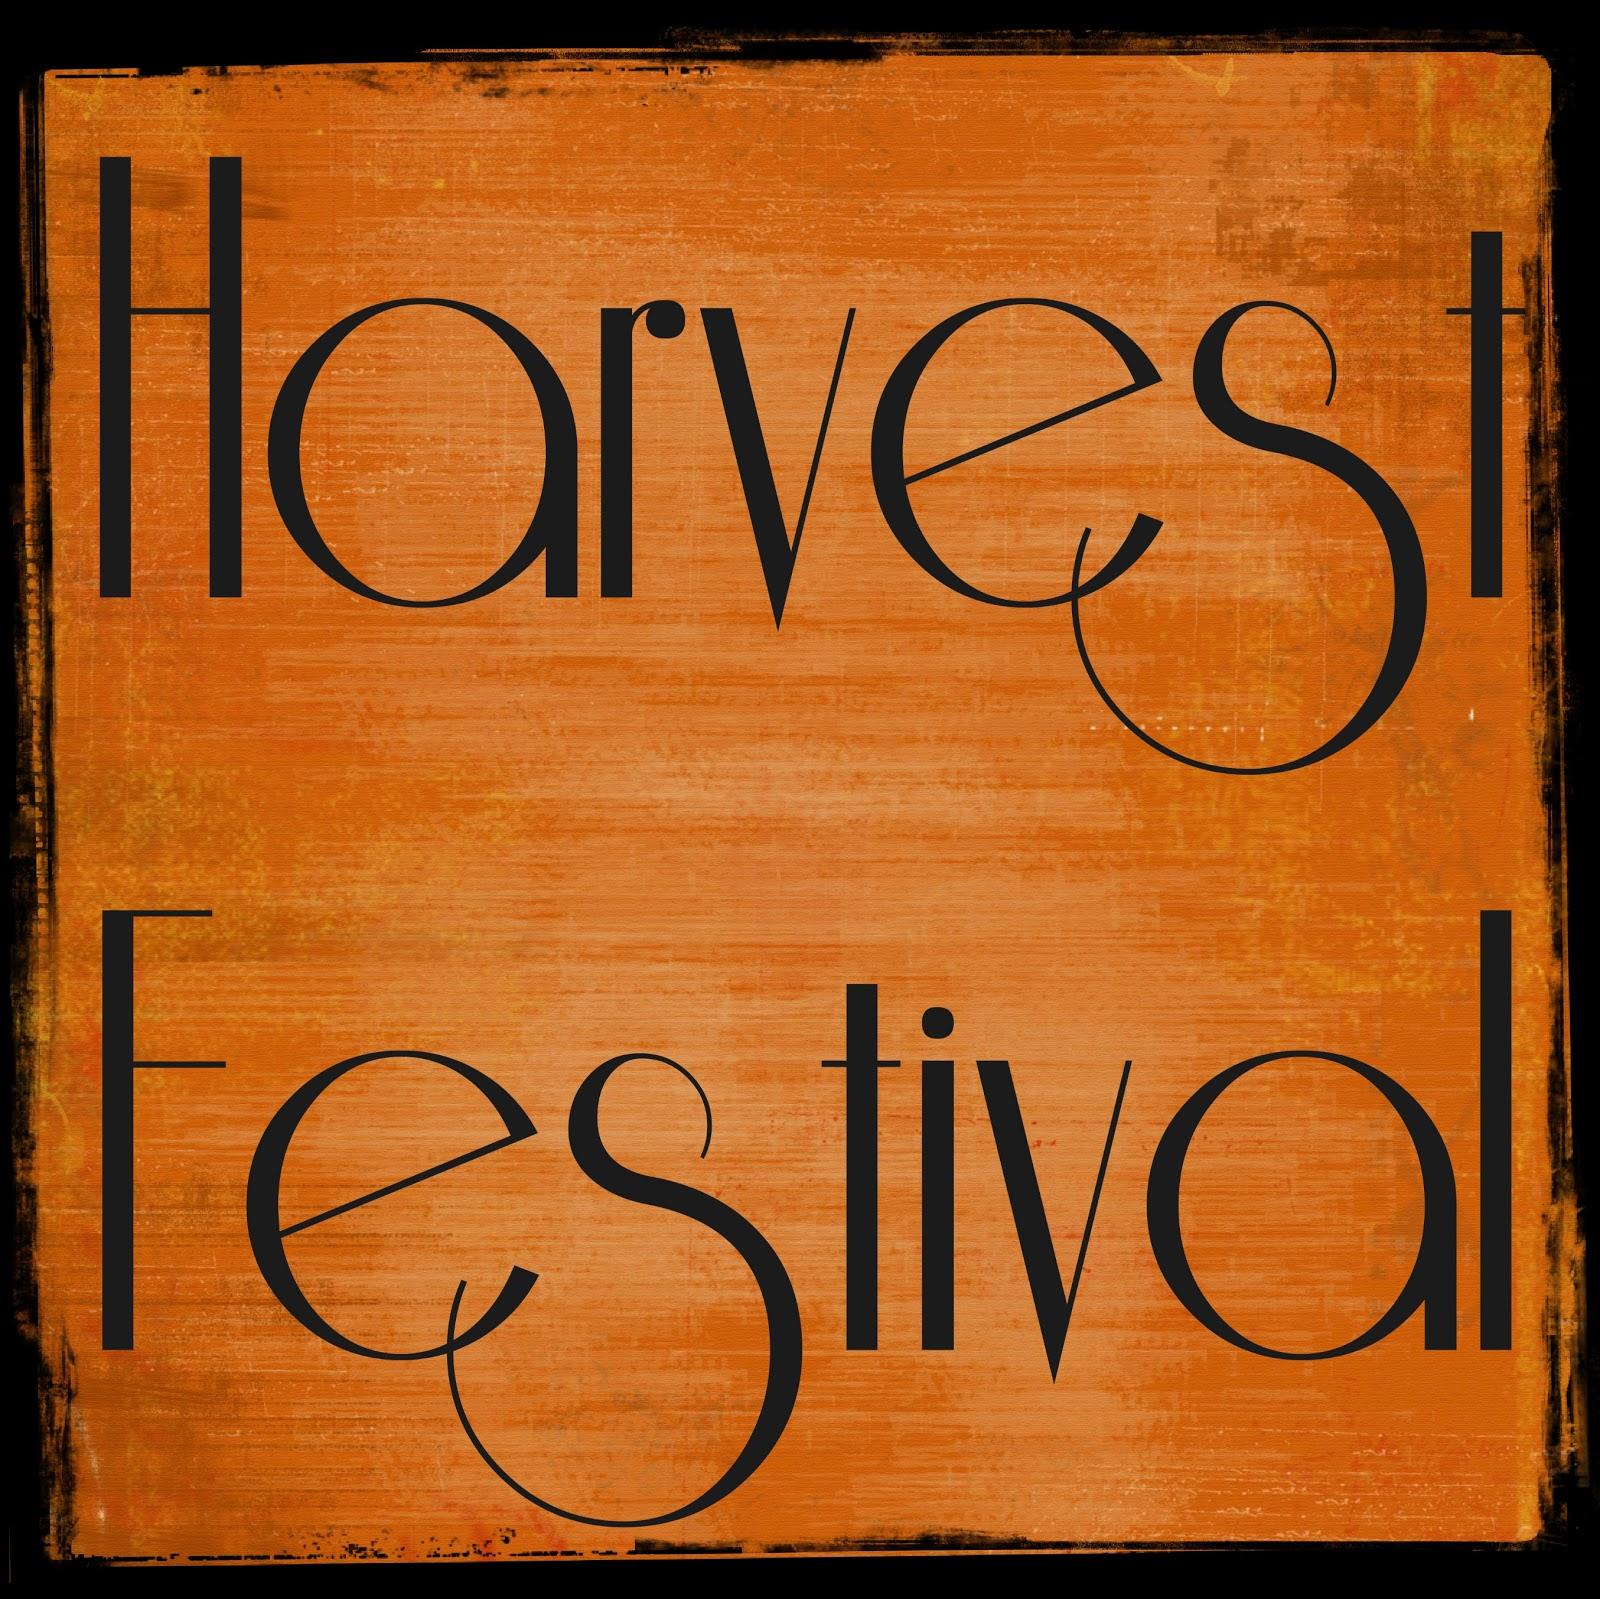 Cutting Edge Stencils Explores Island Adventures: Harvest Festival! October SPARK Party Features